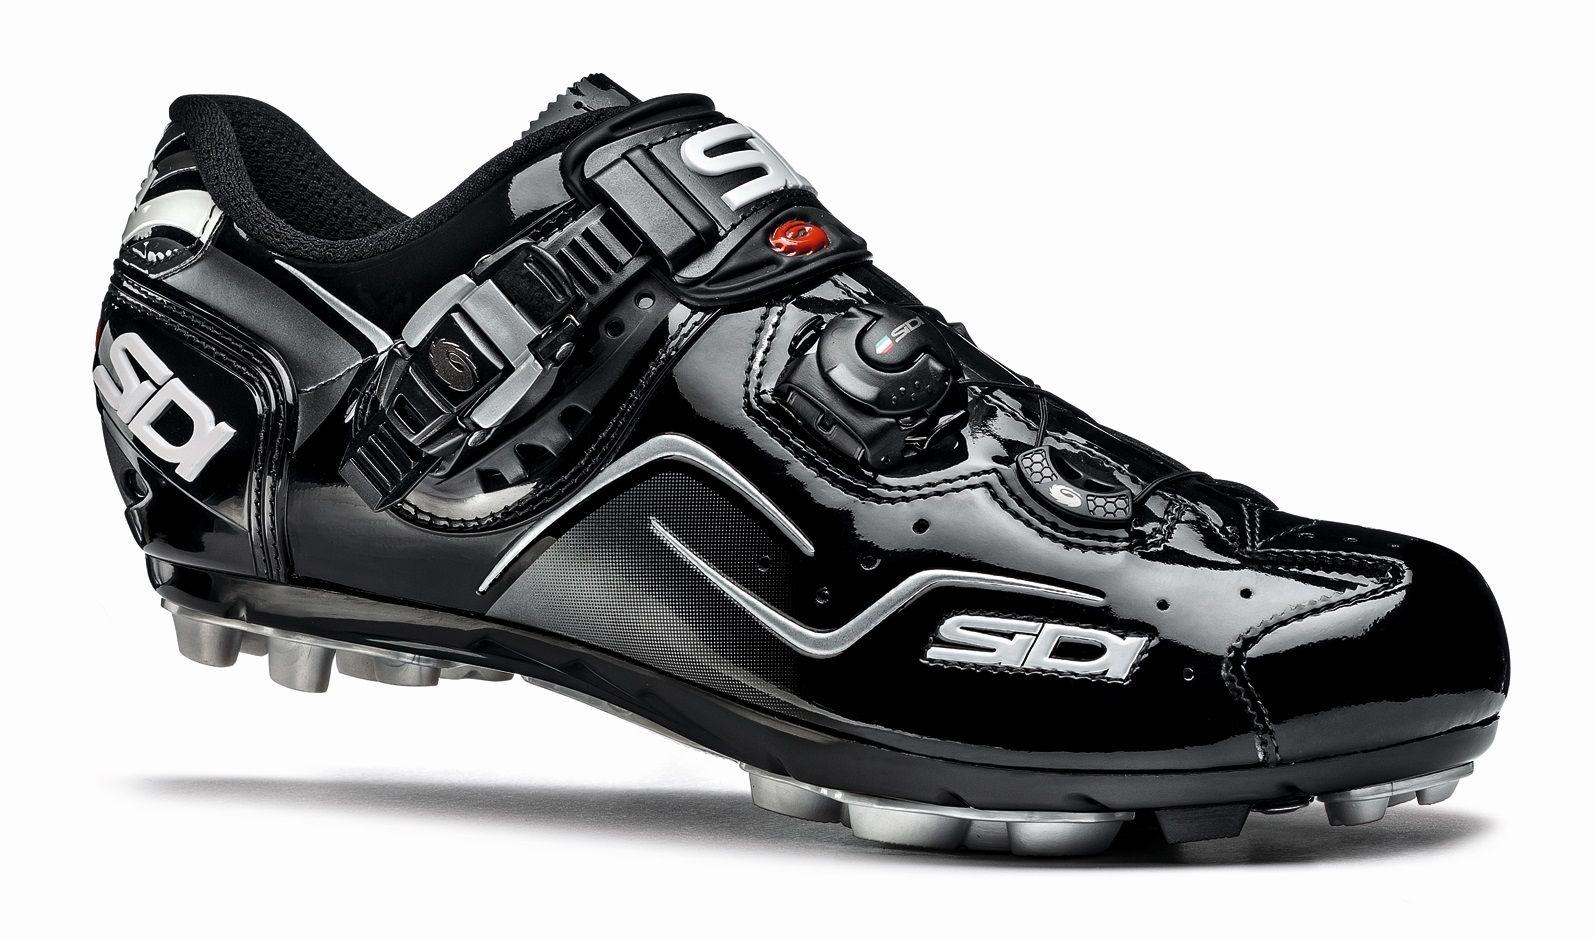 Chaussures Sidi MTB CAPE noir verni - 41